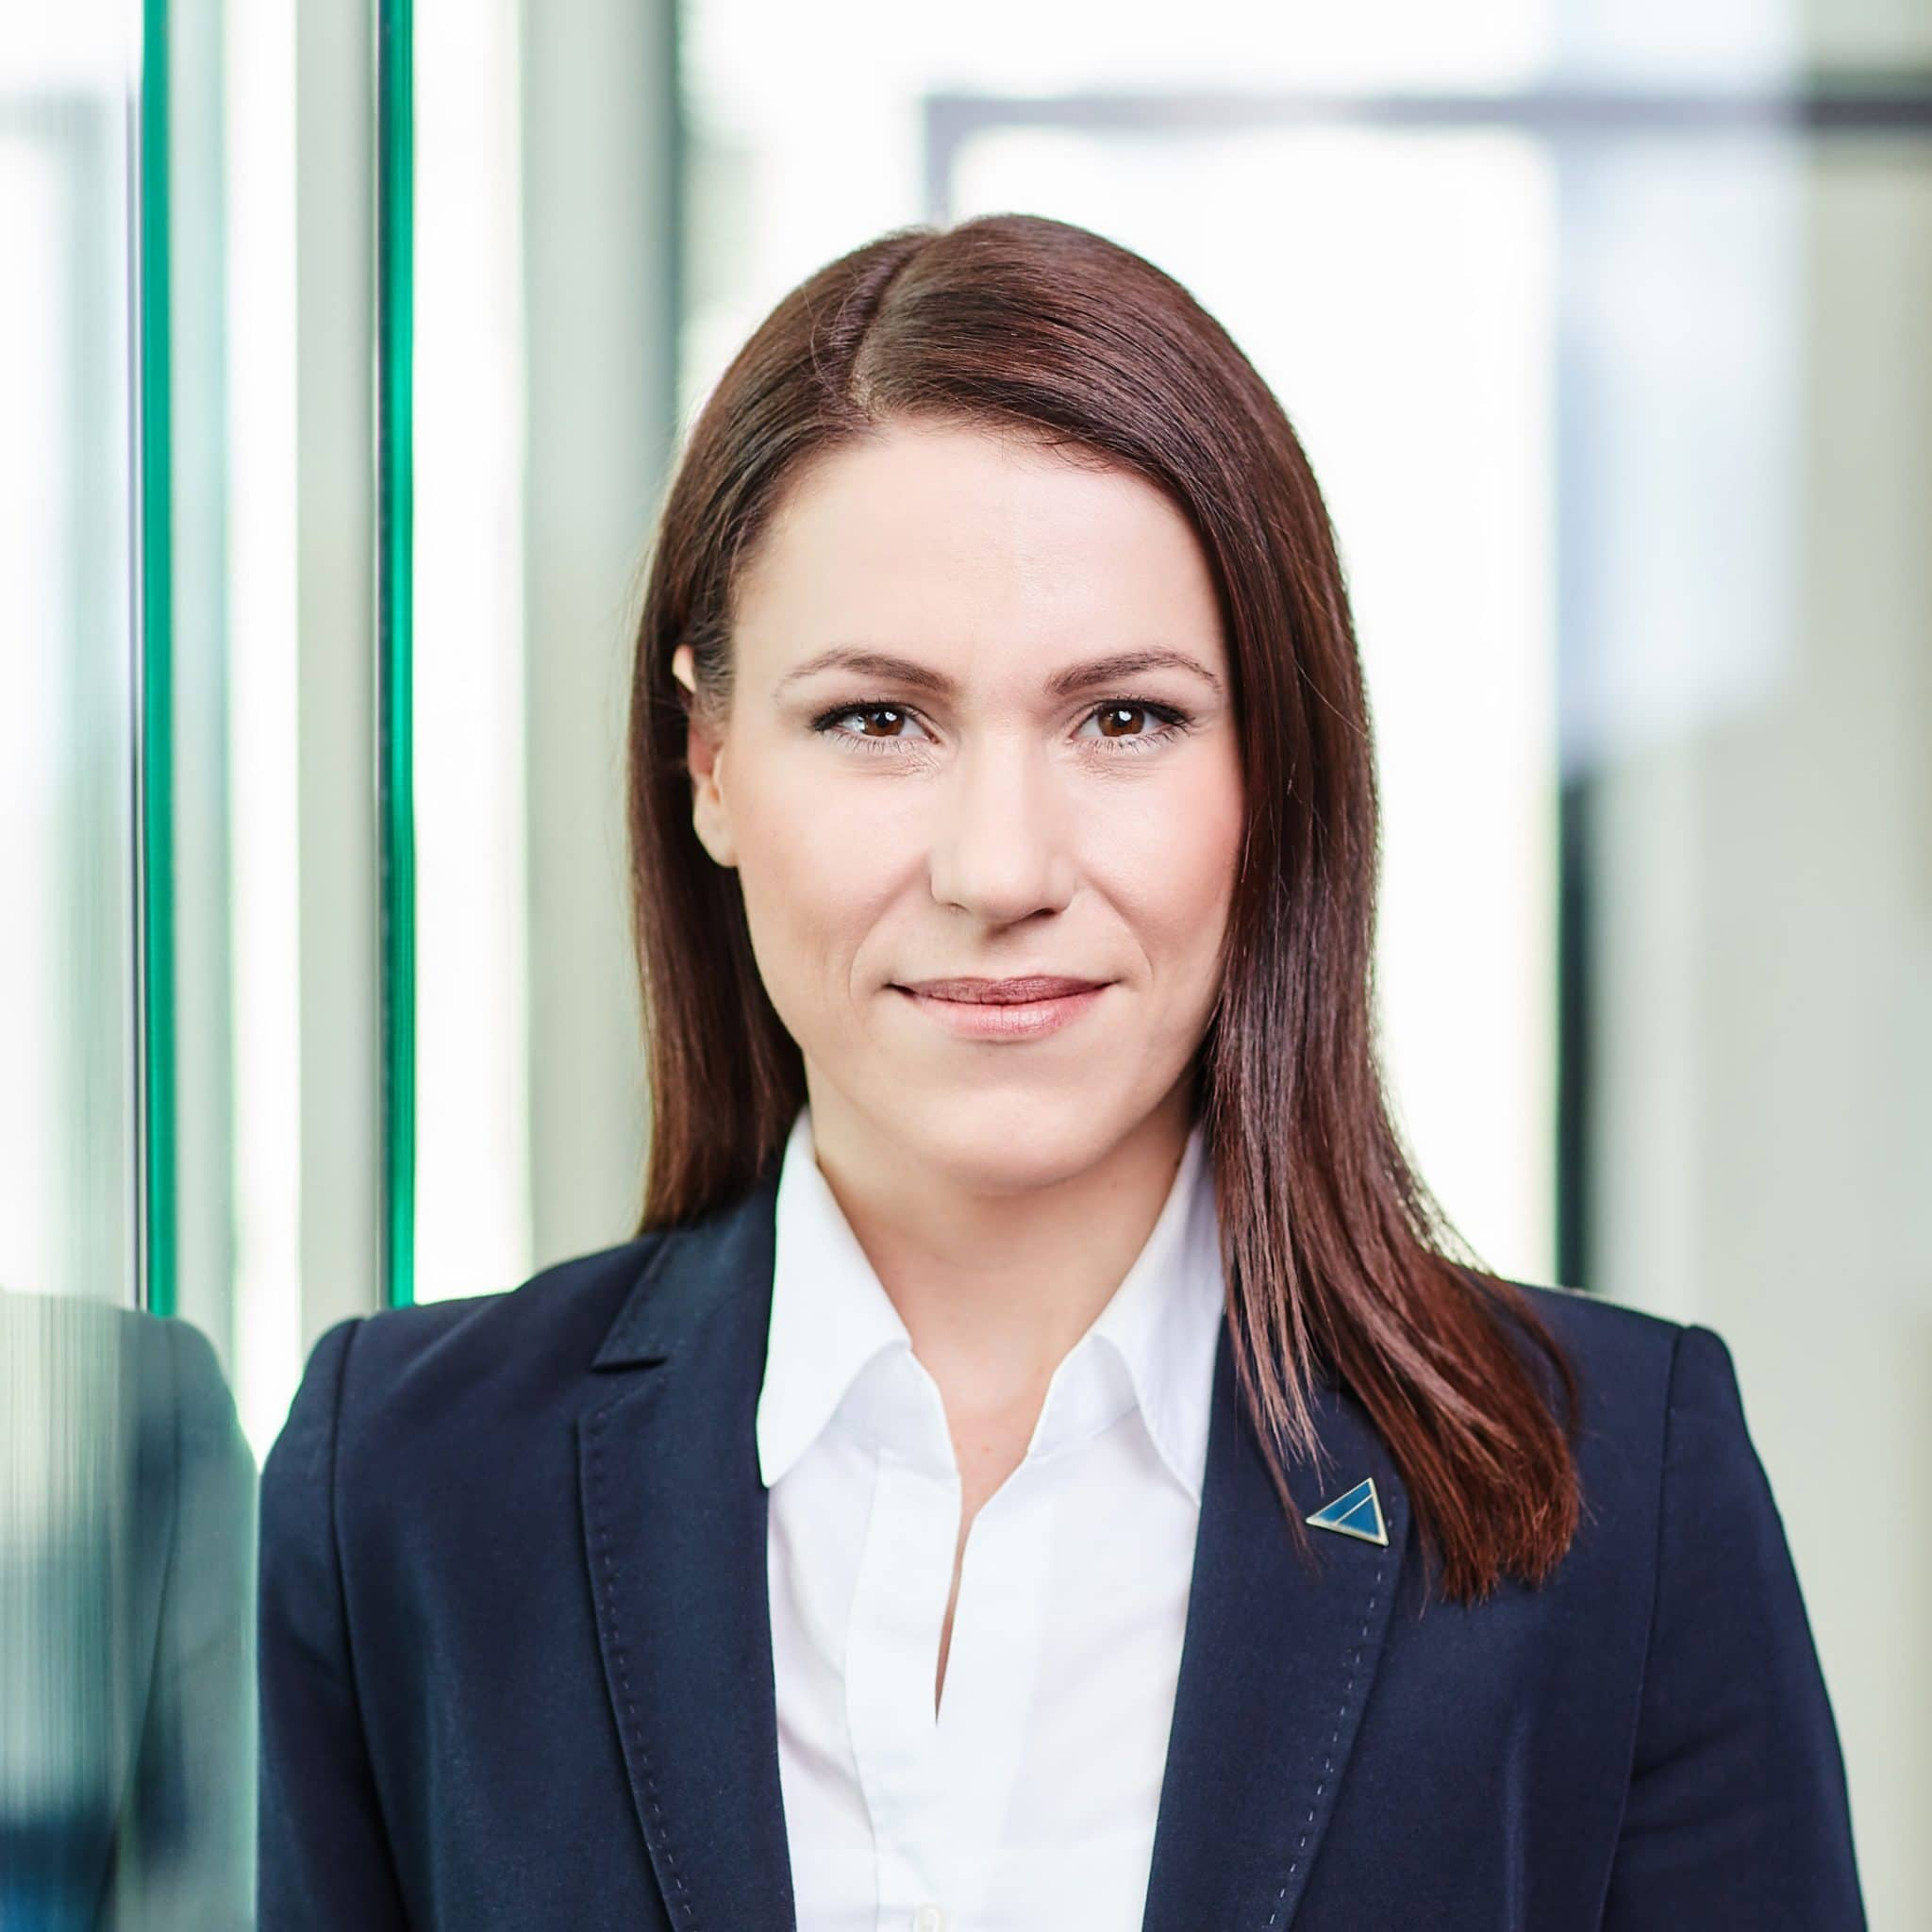 Nina Lenz